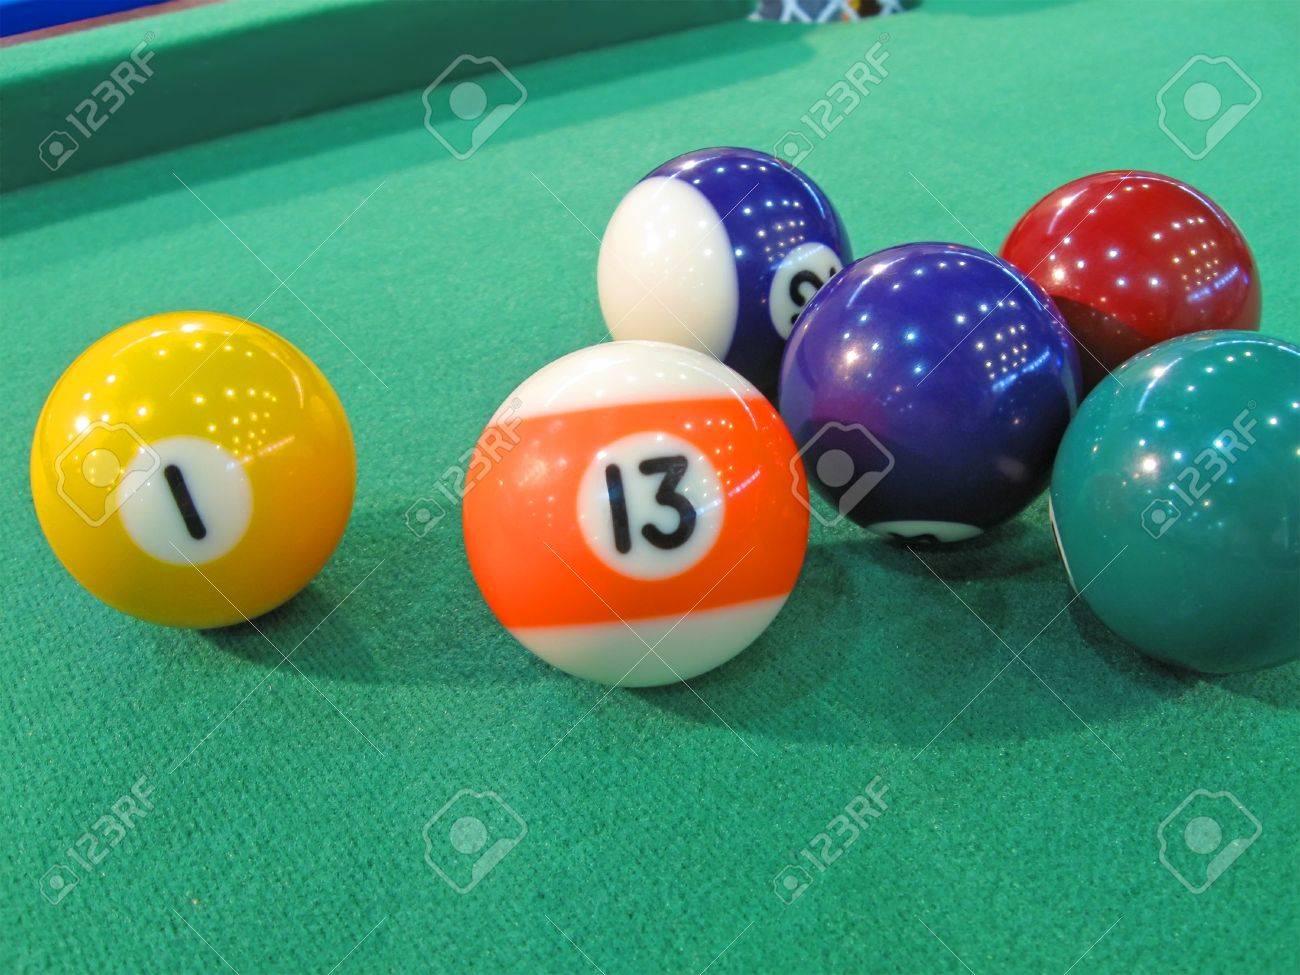 billiard-table with colorful balls  billiards sport concept Stock Photo - 12370730